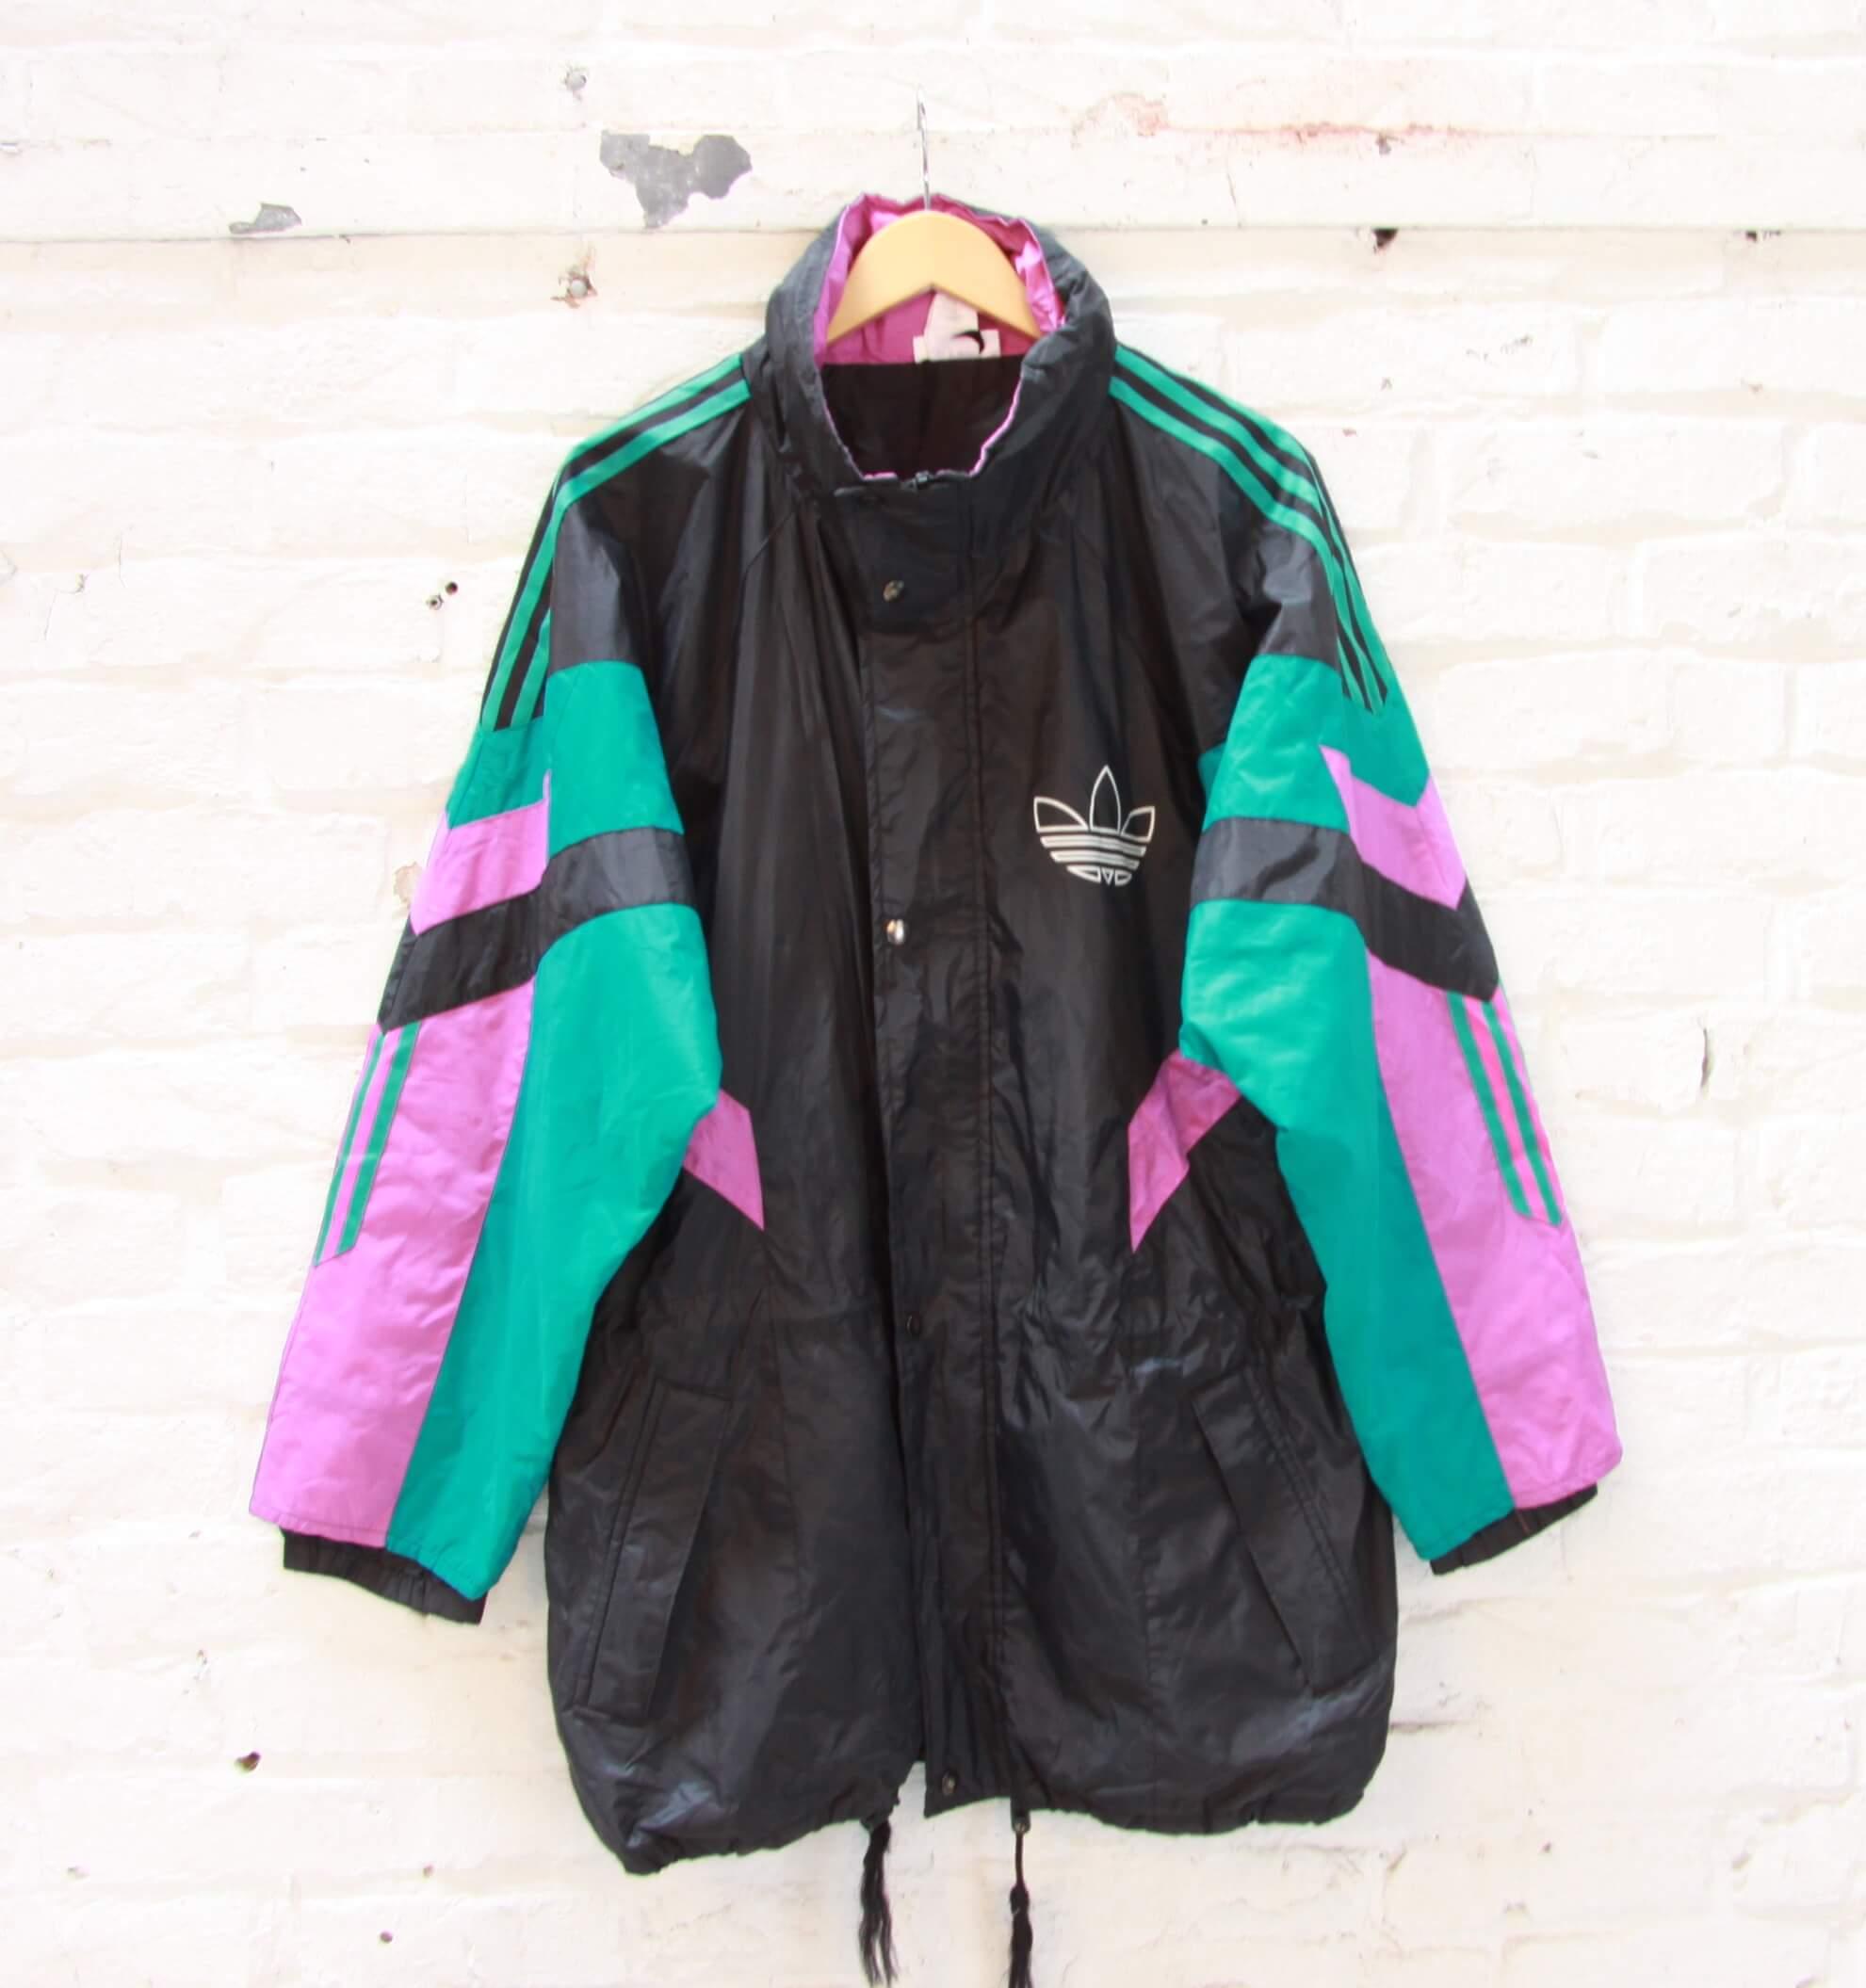 Veste longue Homme Adidas Vintage Marron Vert